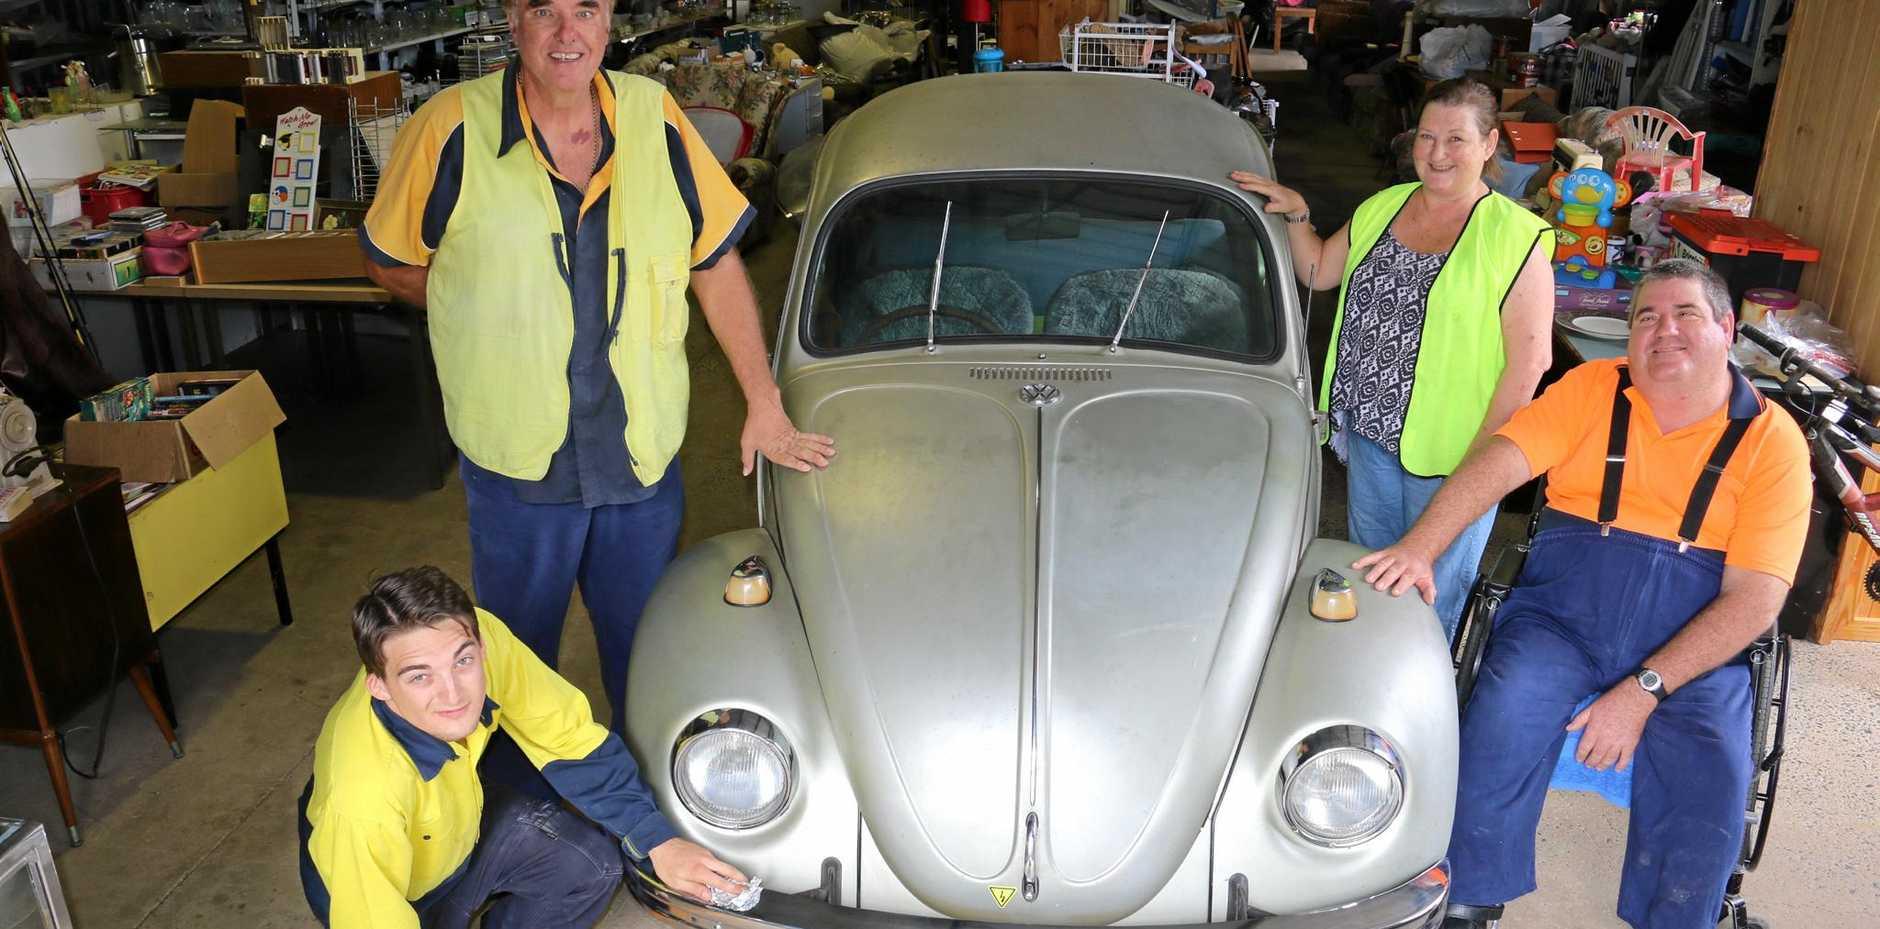 BEEP: The Anuha Tip Shop team with the 1967 Volkswagen Beetle.